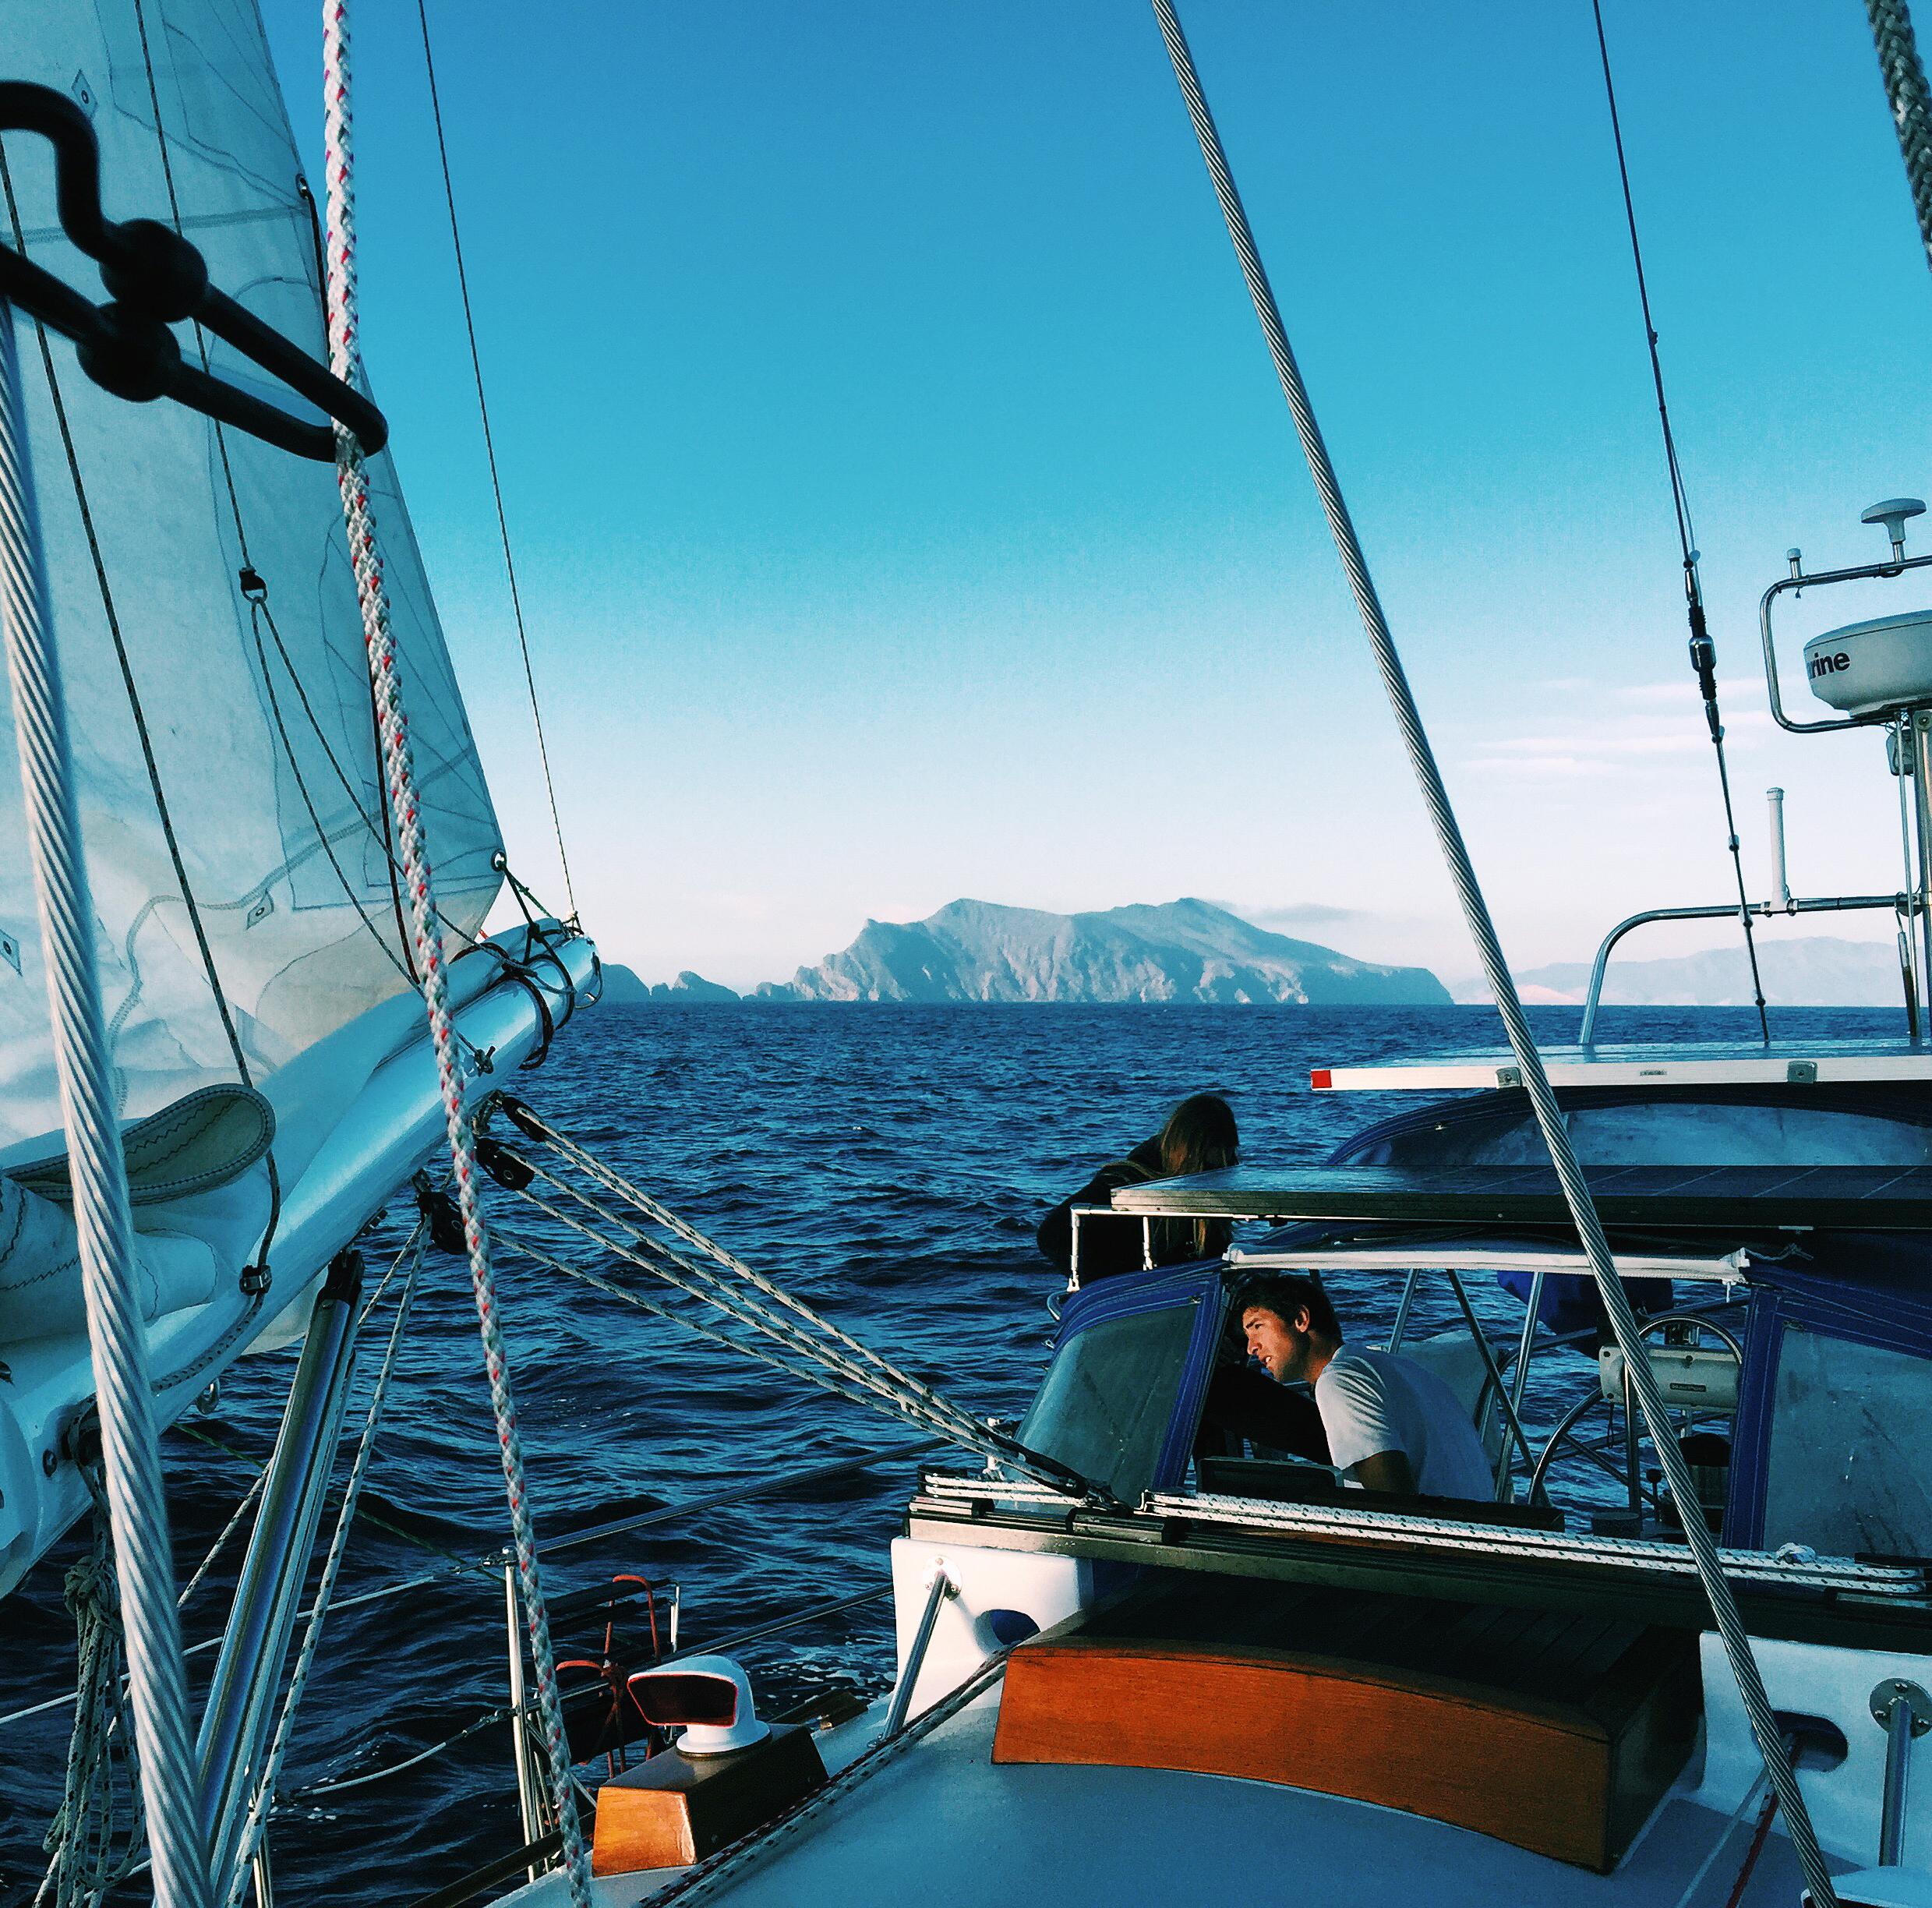 Sailing past Anacapa Island. Photo by Ben Brue .